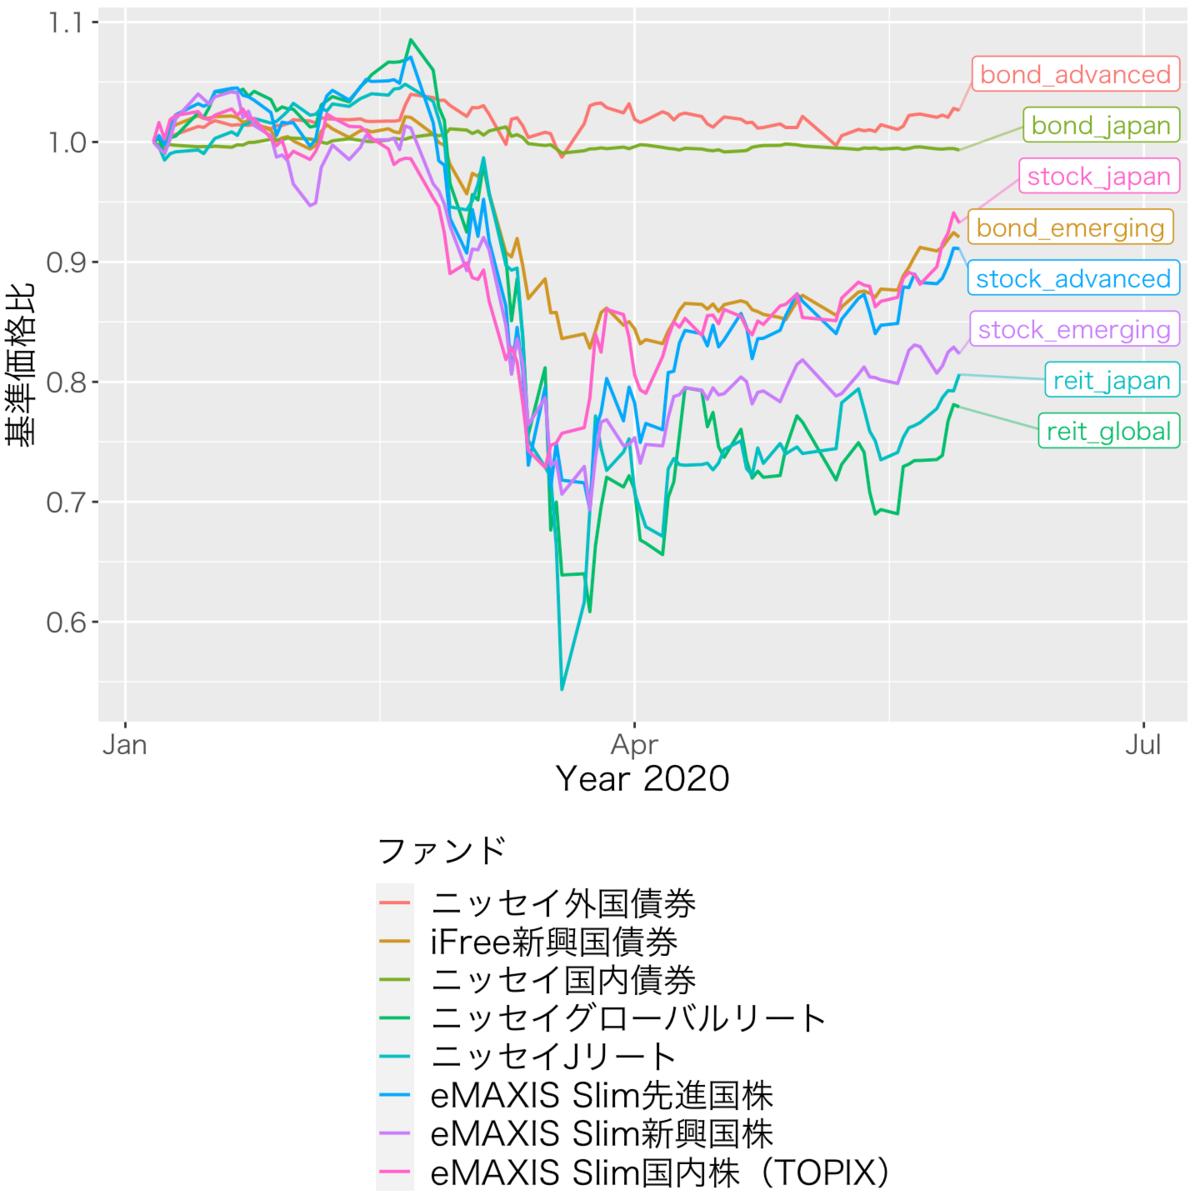 f:id:accumulationstrategies:20200531211107p:plain